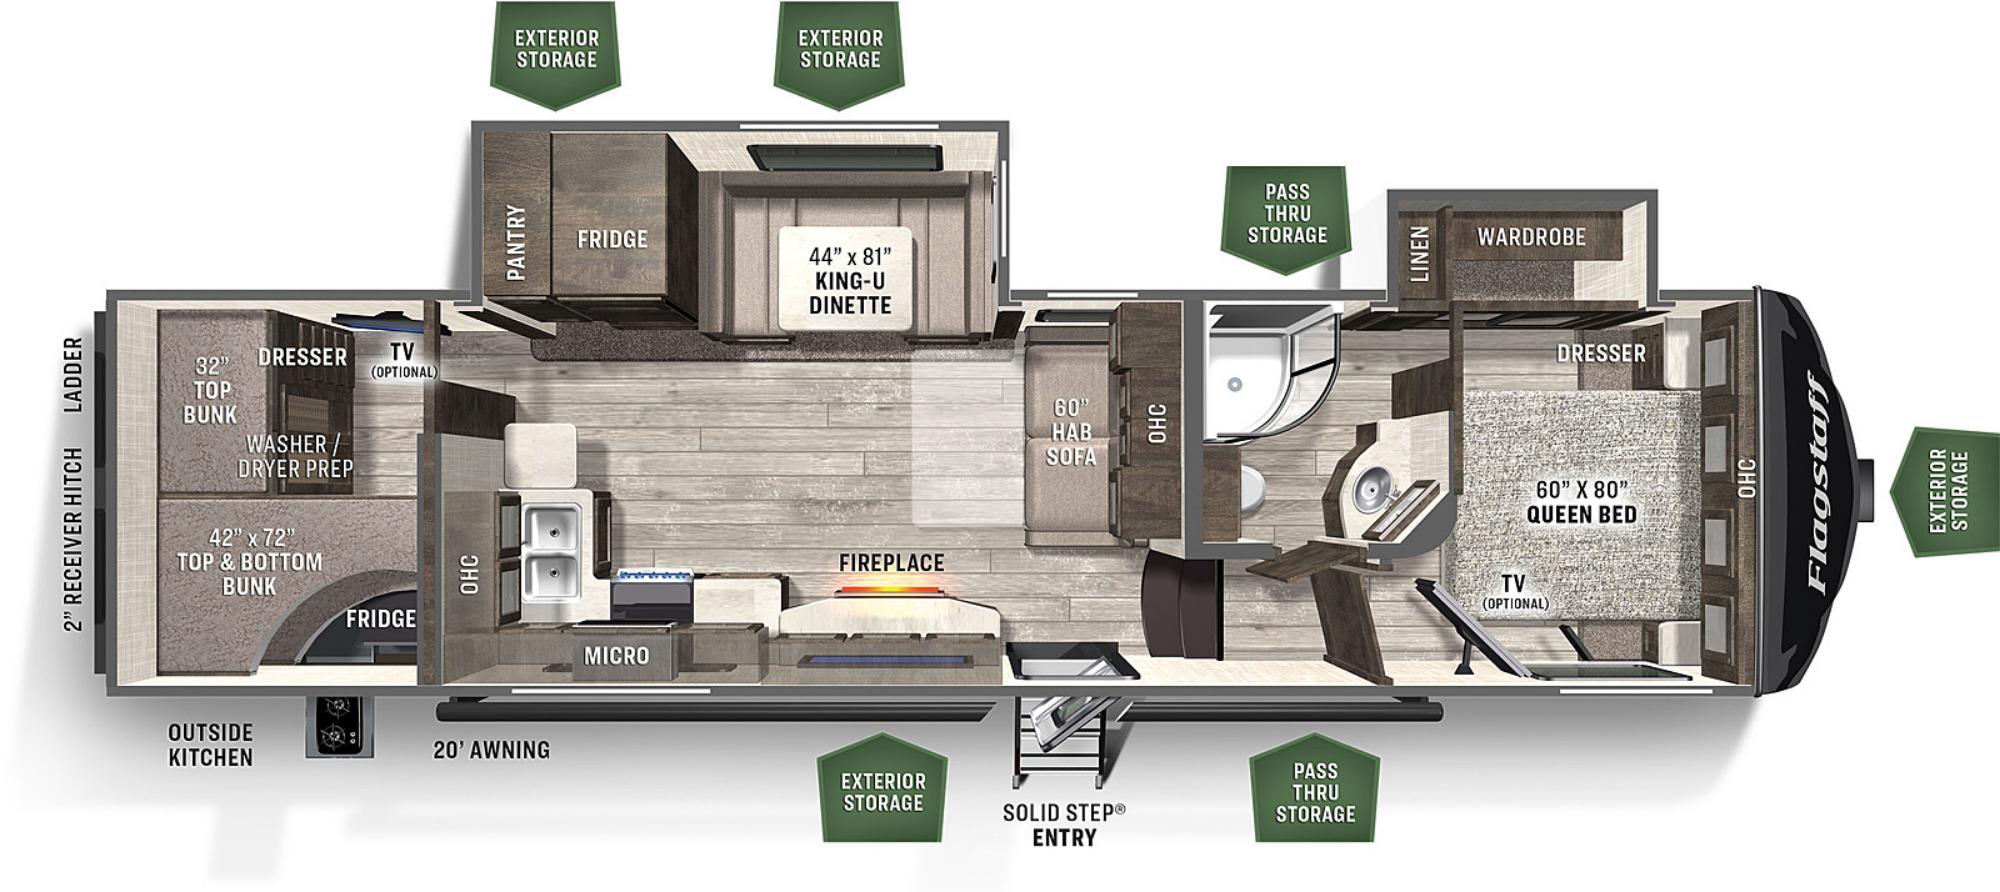 View Floor Plan for 2021 FOREST RIVER FLAGSTAFF SUPER LITE 529BH